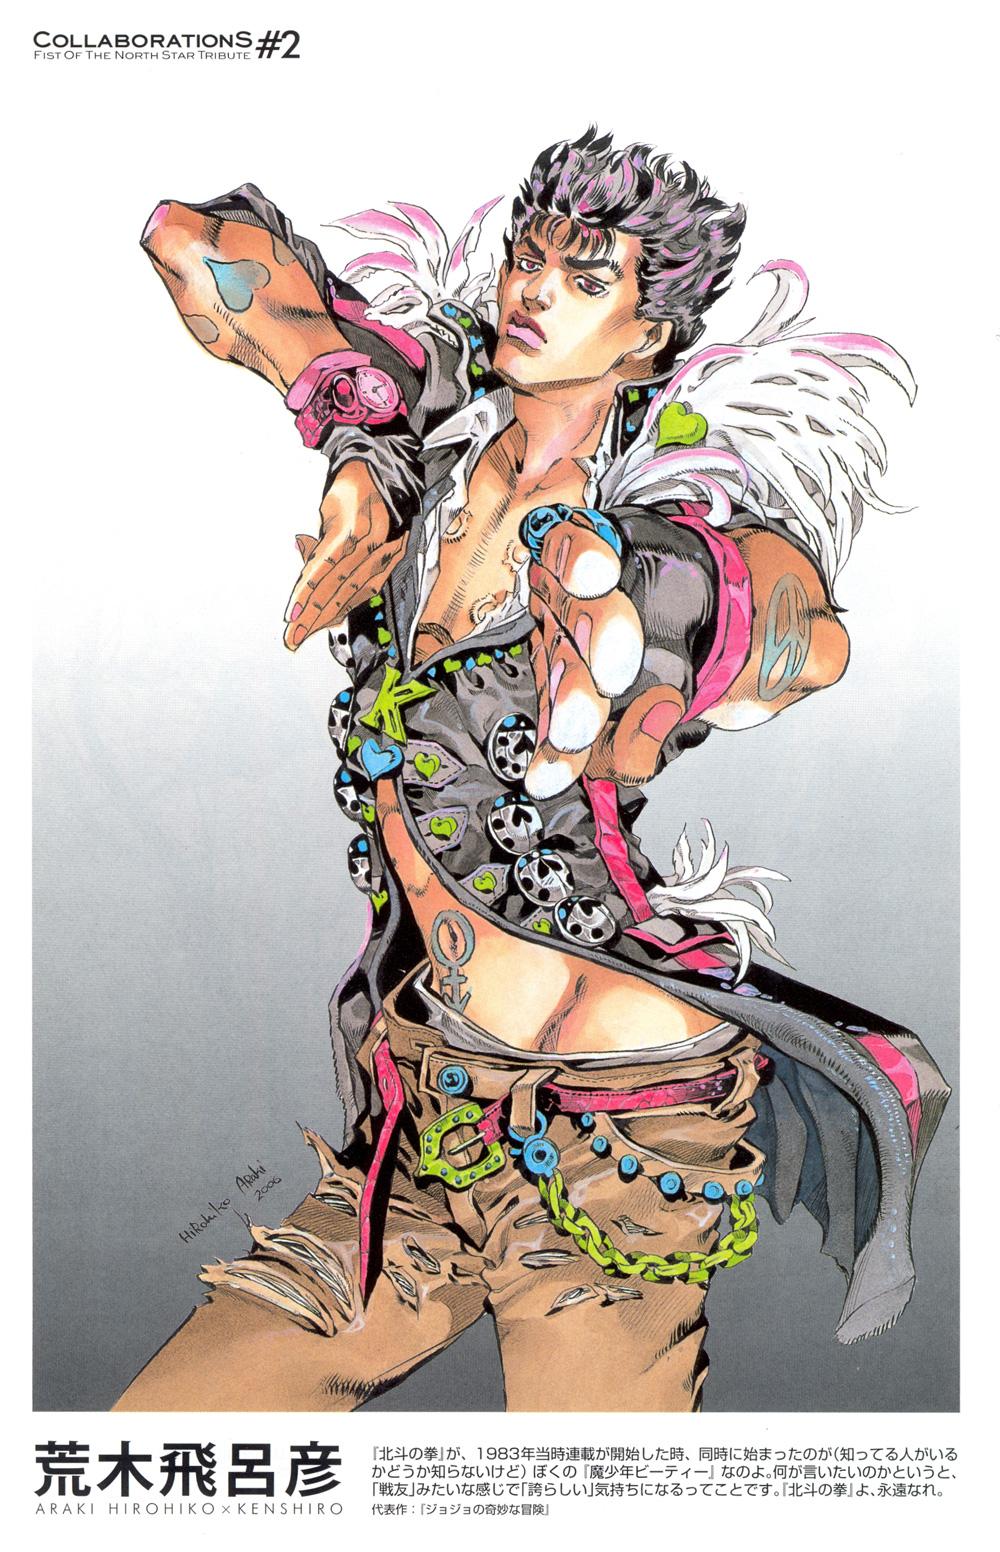 Drawn naruto hirohiko araki North draws 10th StardustCrusaders the